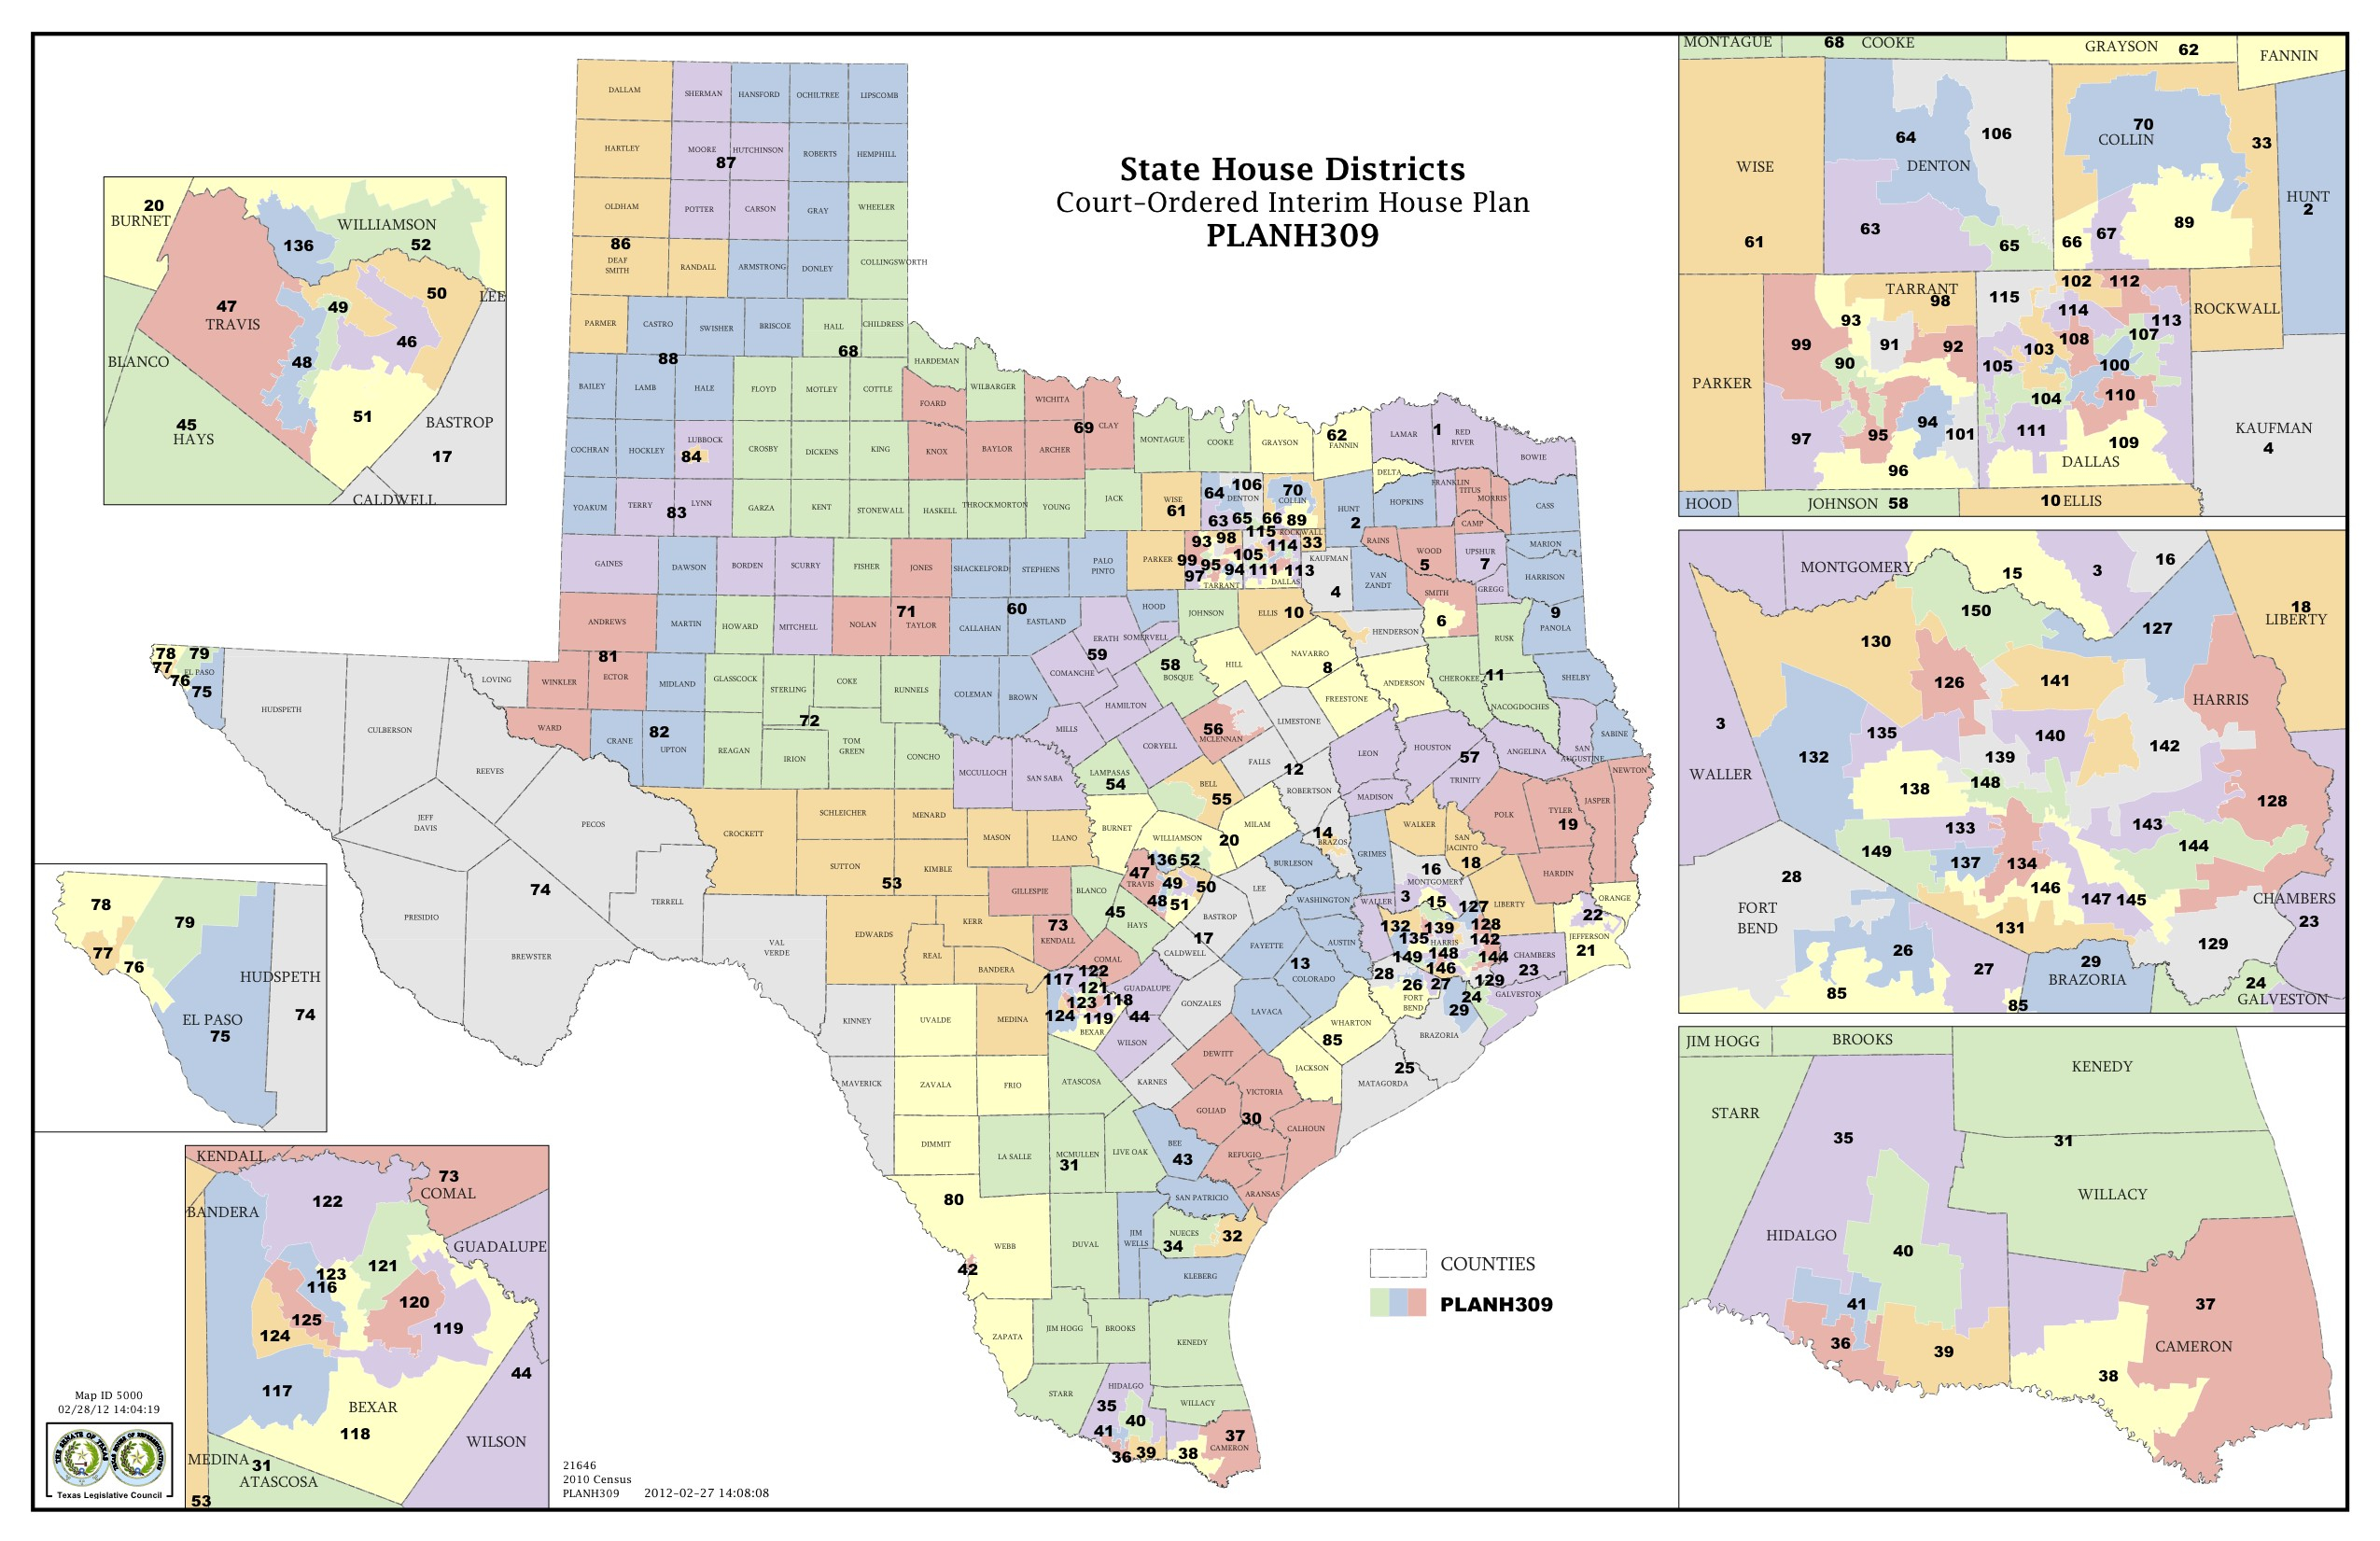 Texas Us Senate District Map New State Senate Awesome Map Texas - Texas State Senate District 10 Map